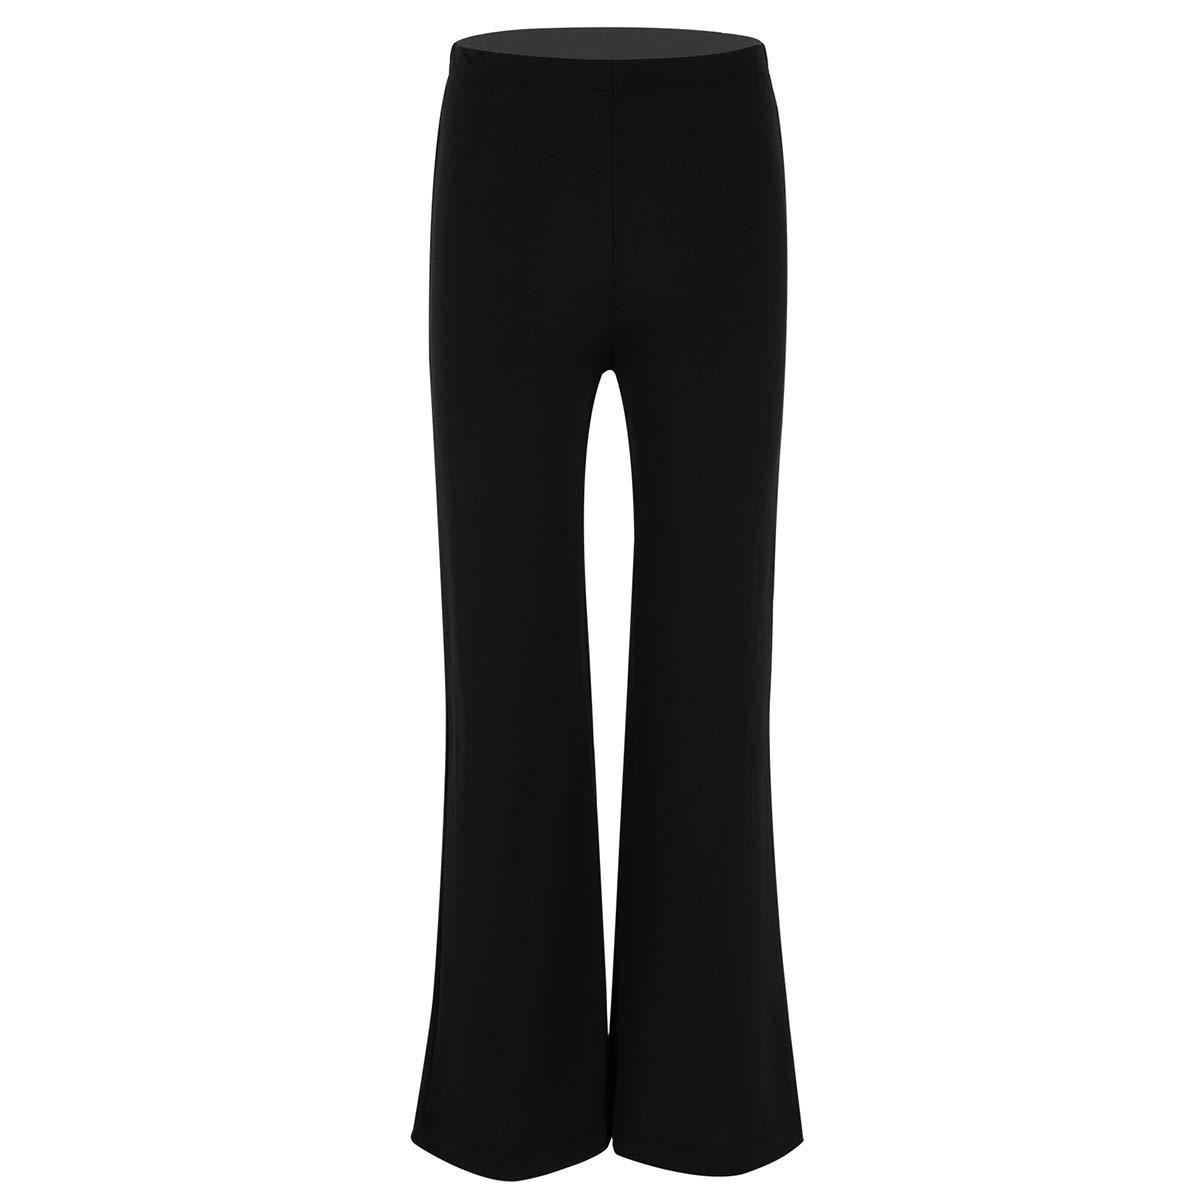 MSemis Kids Girls Boys Stretchy Loose Classic Jazz Yoga Pants Dancewear Trousers